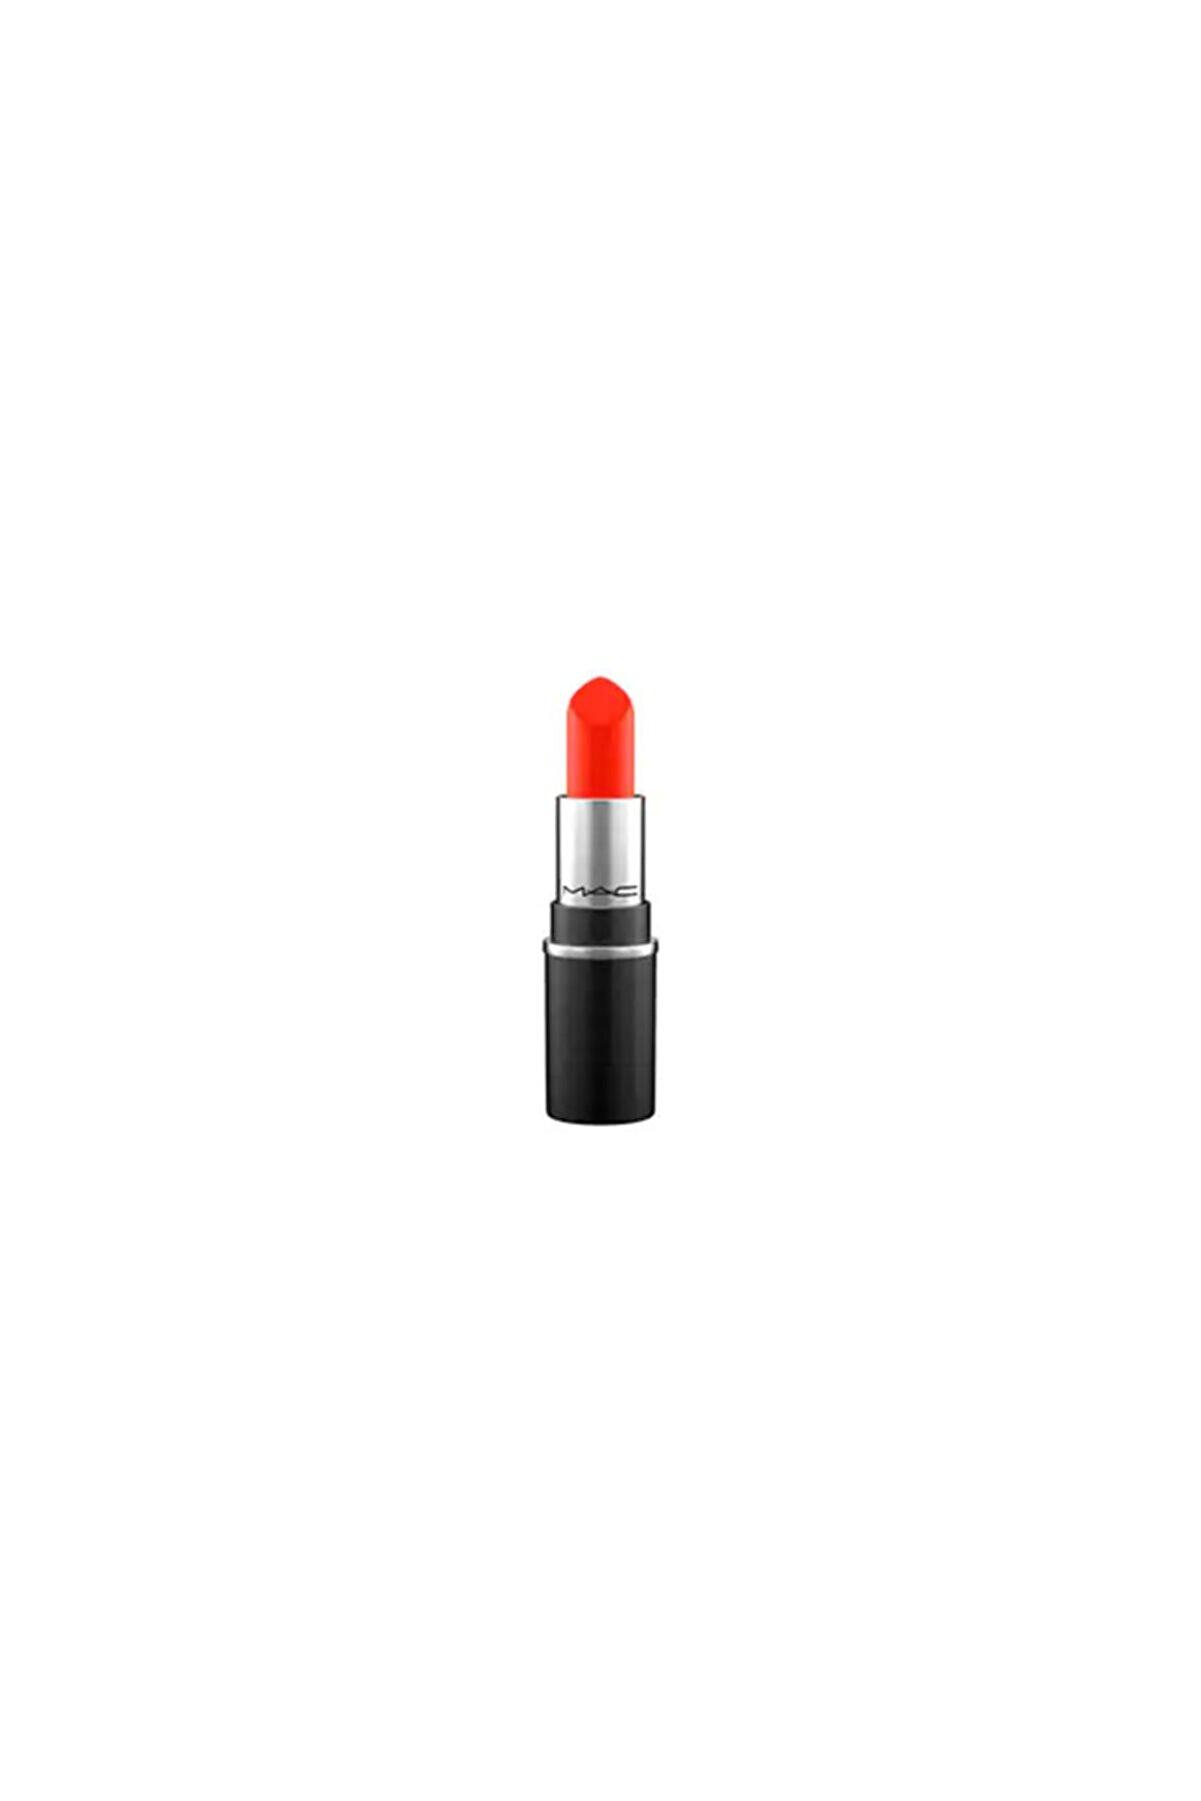 Mac Mini Ruj / Little Mac Lady Danger 1.8 G 773602577767